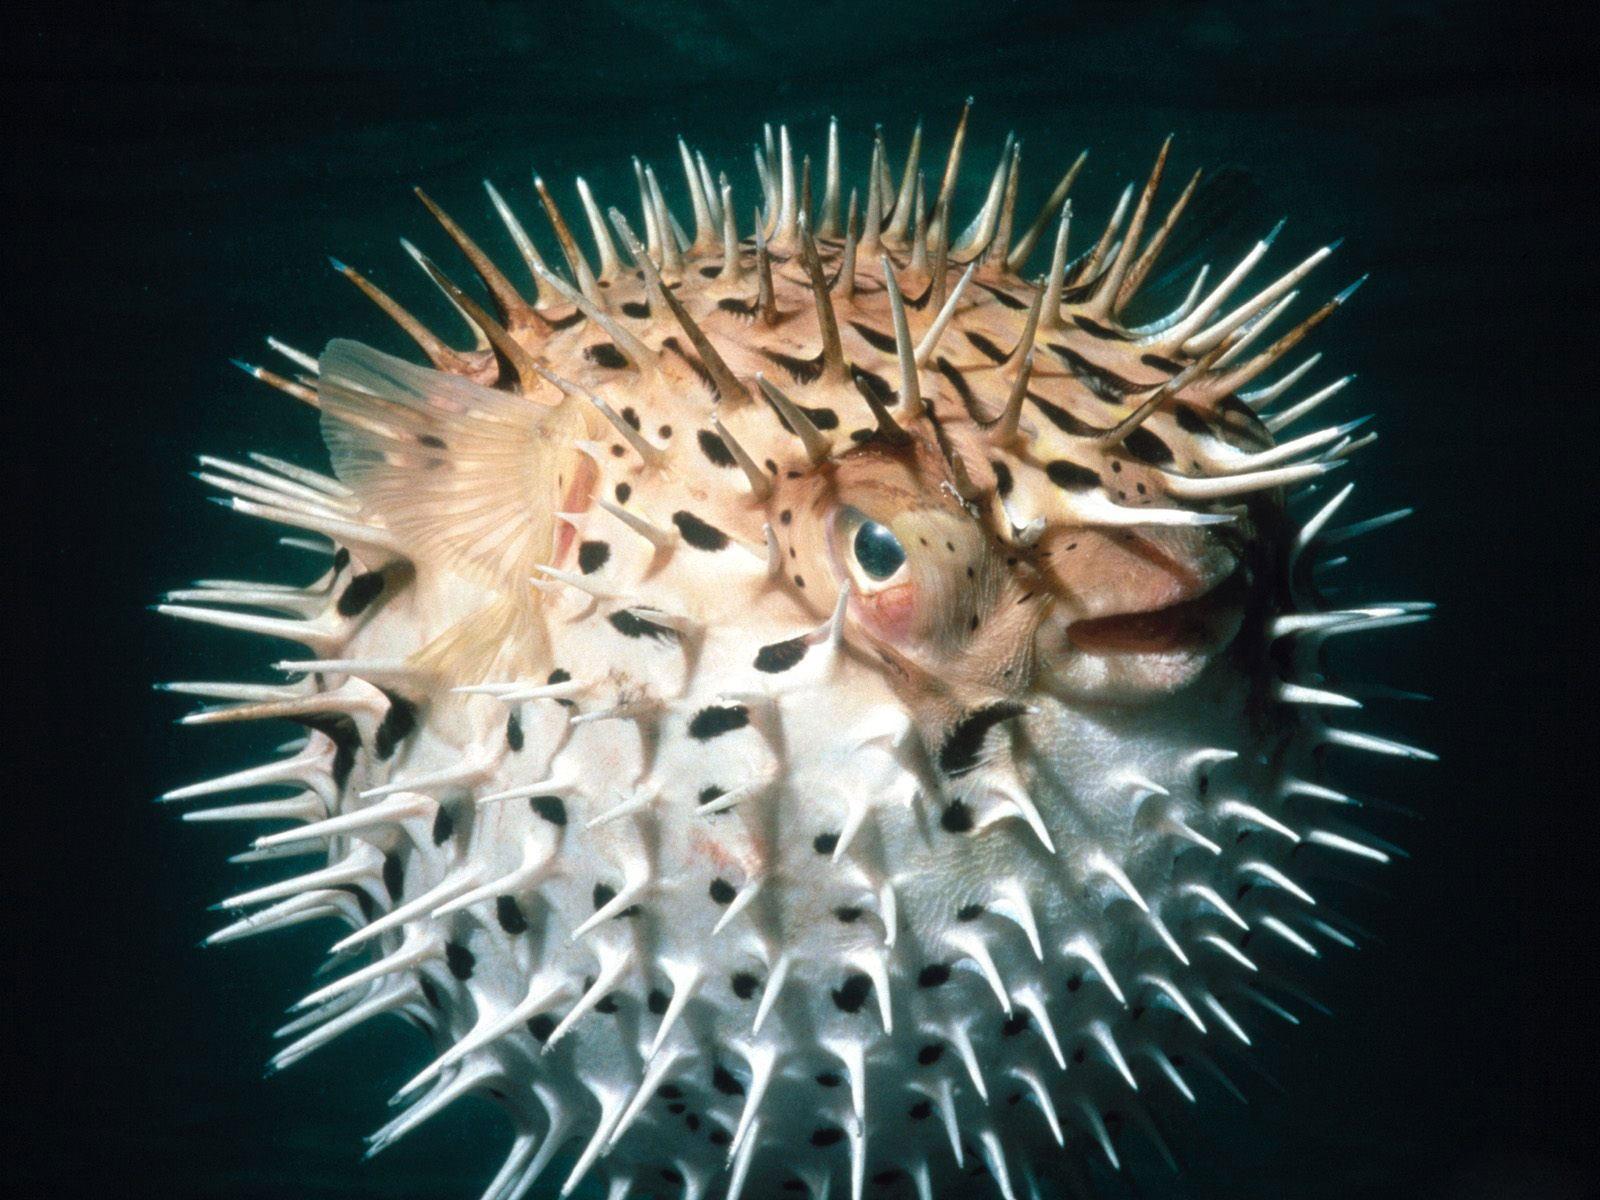 Desktop Wallpaper · Gallery · Animals Balloon Fish puffers.